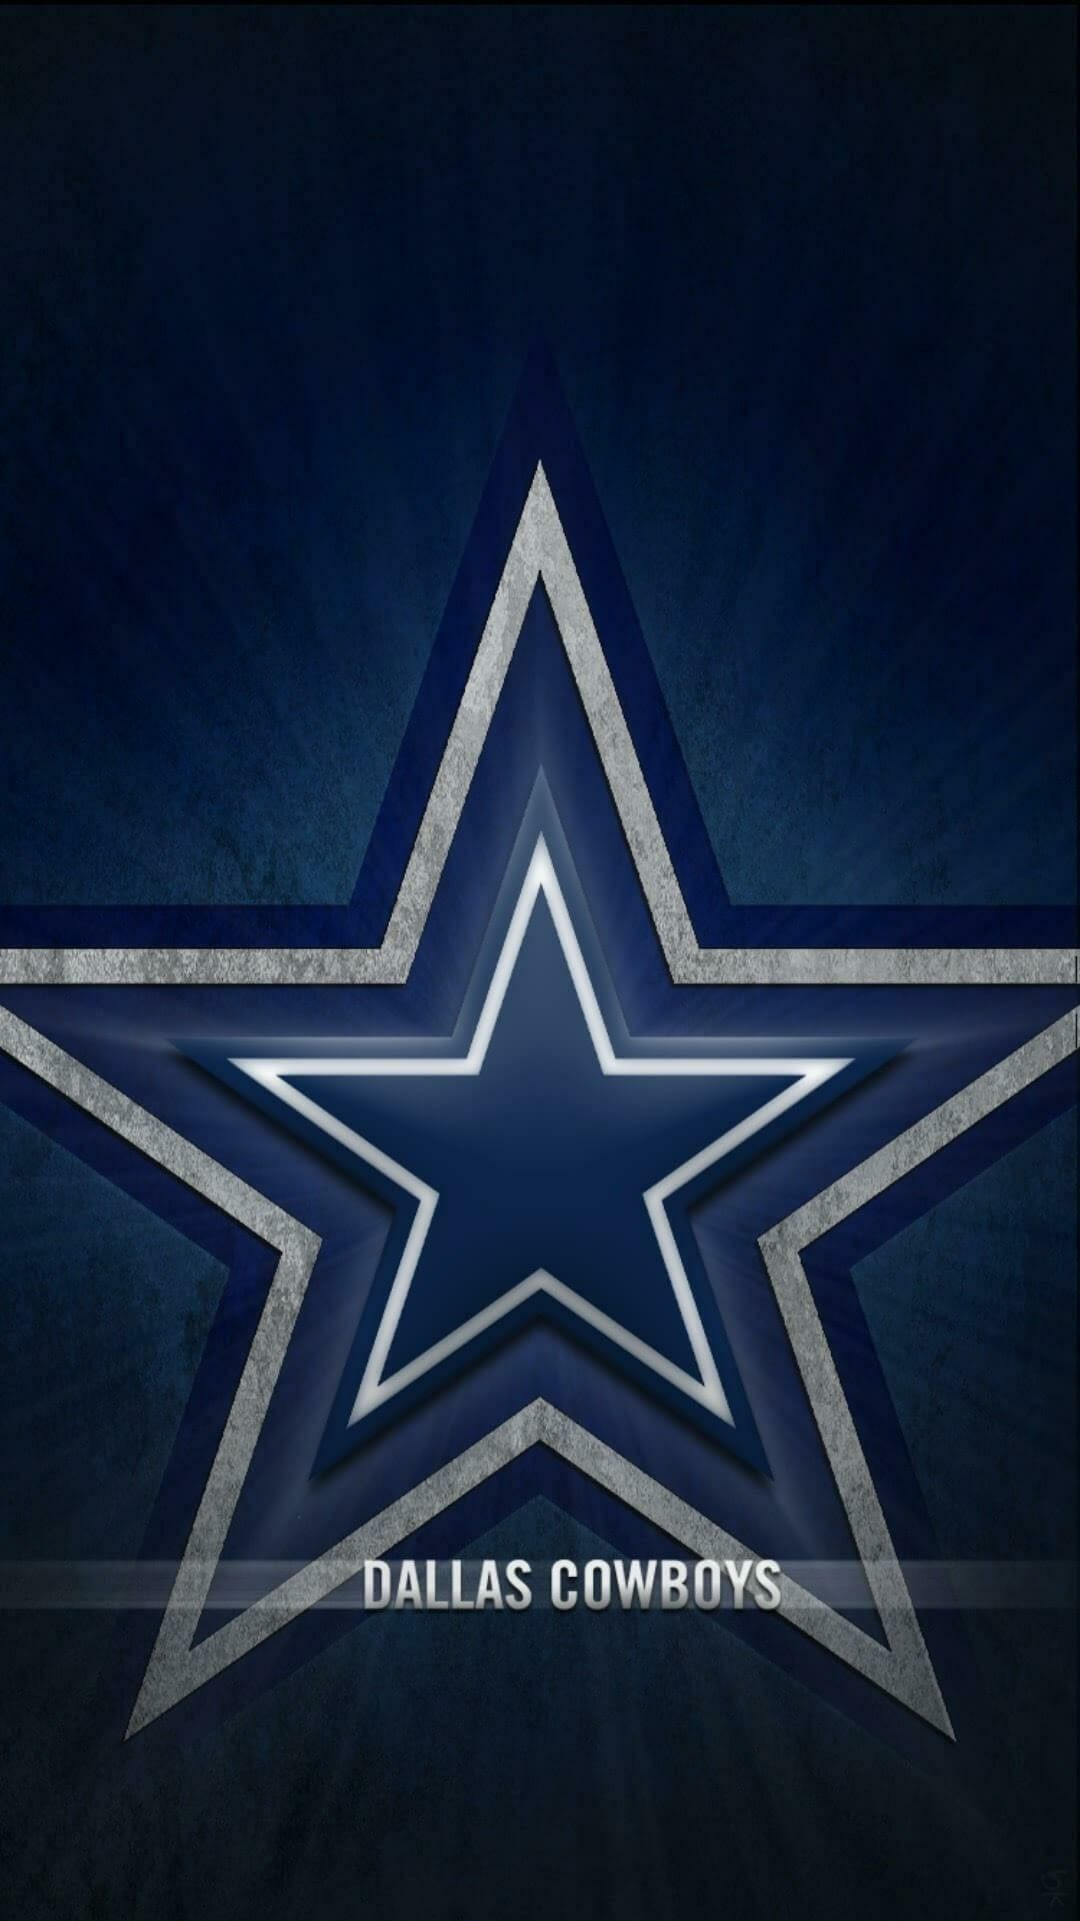 Pin by Chaveli on ☆Dallas Cowboys Baby | Dallas cowboys ...